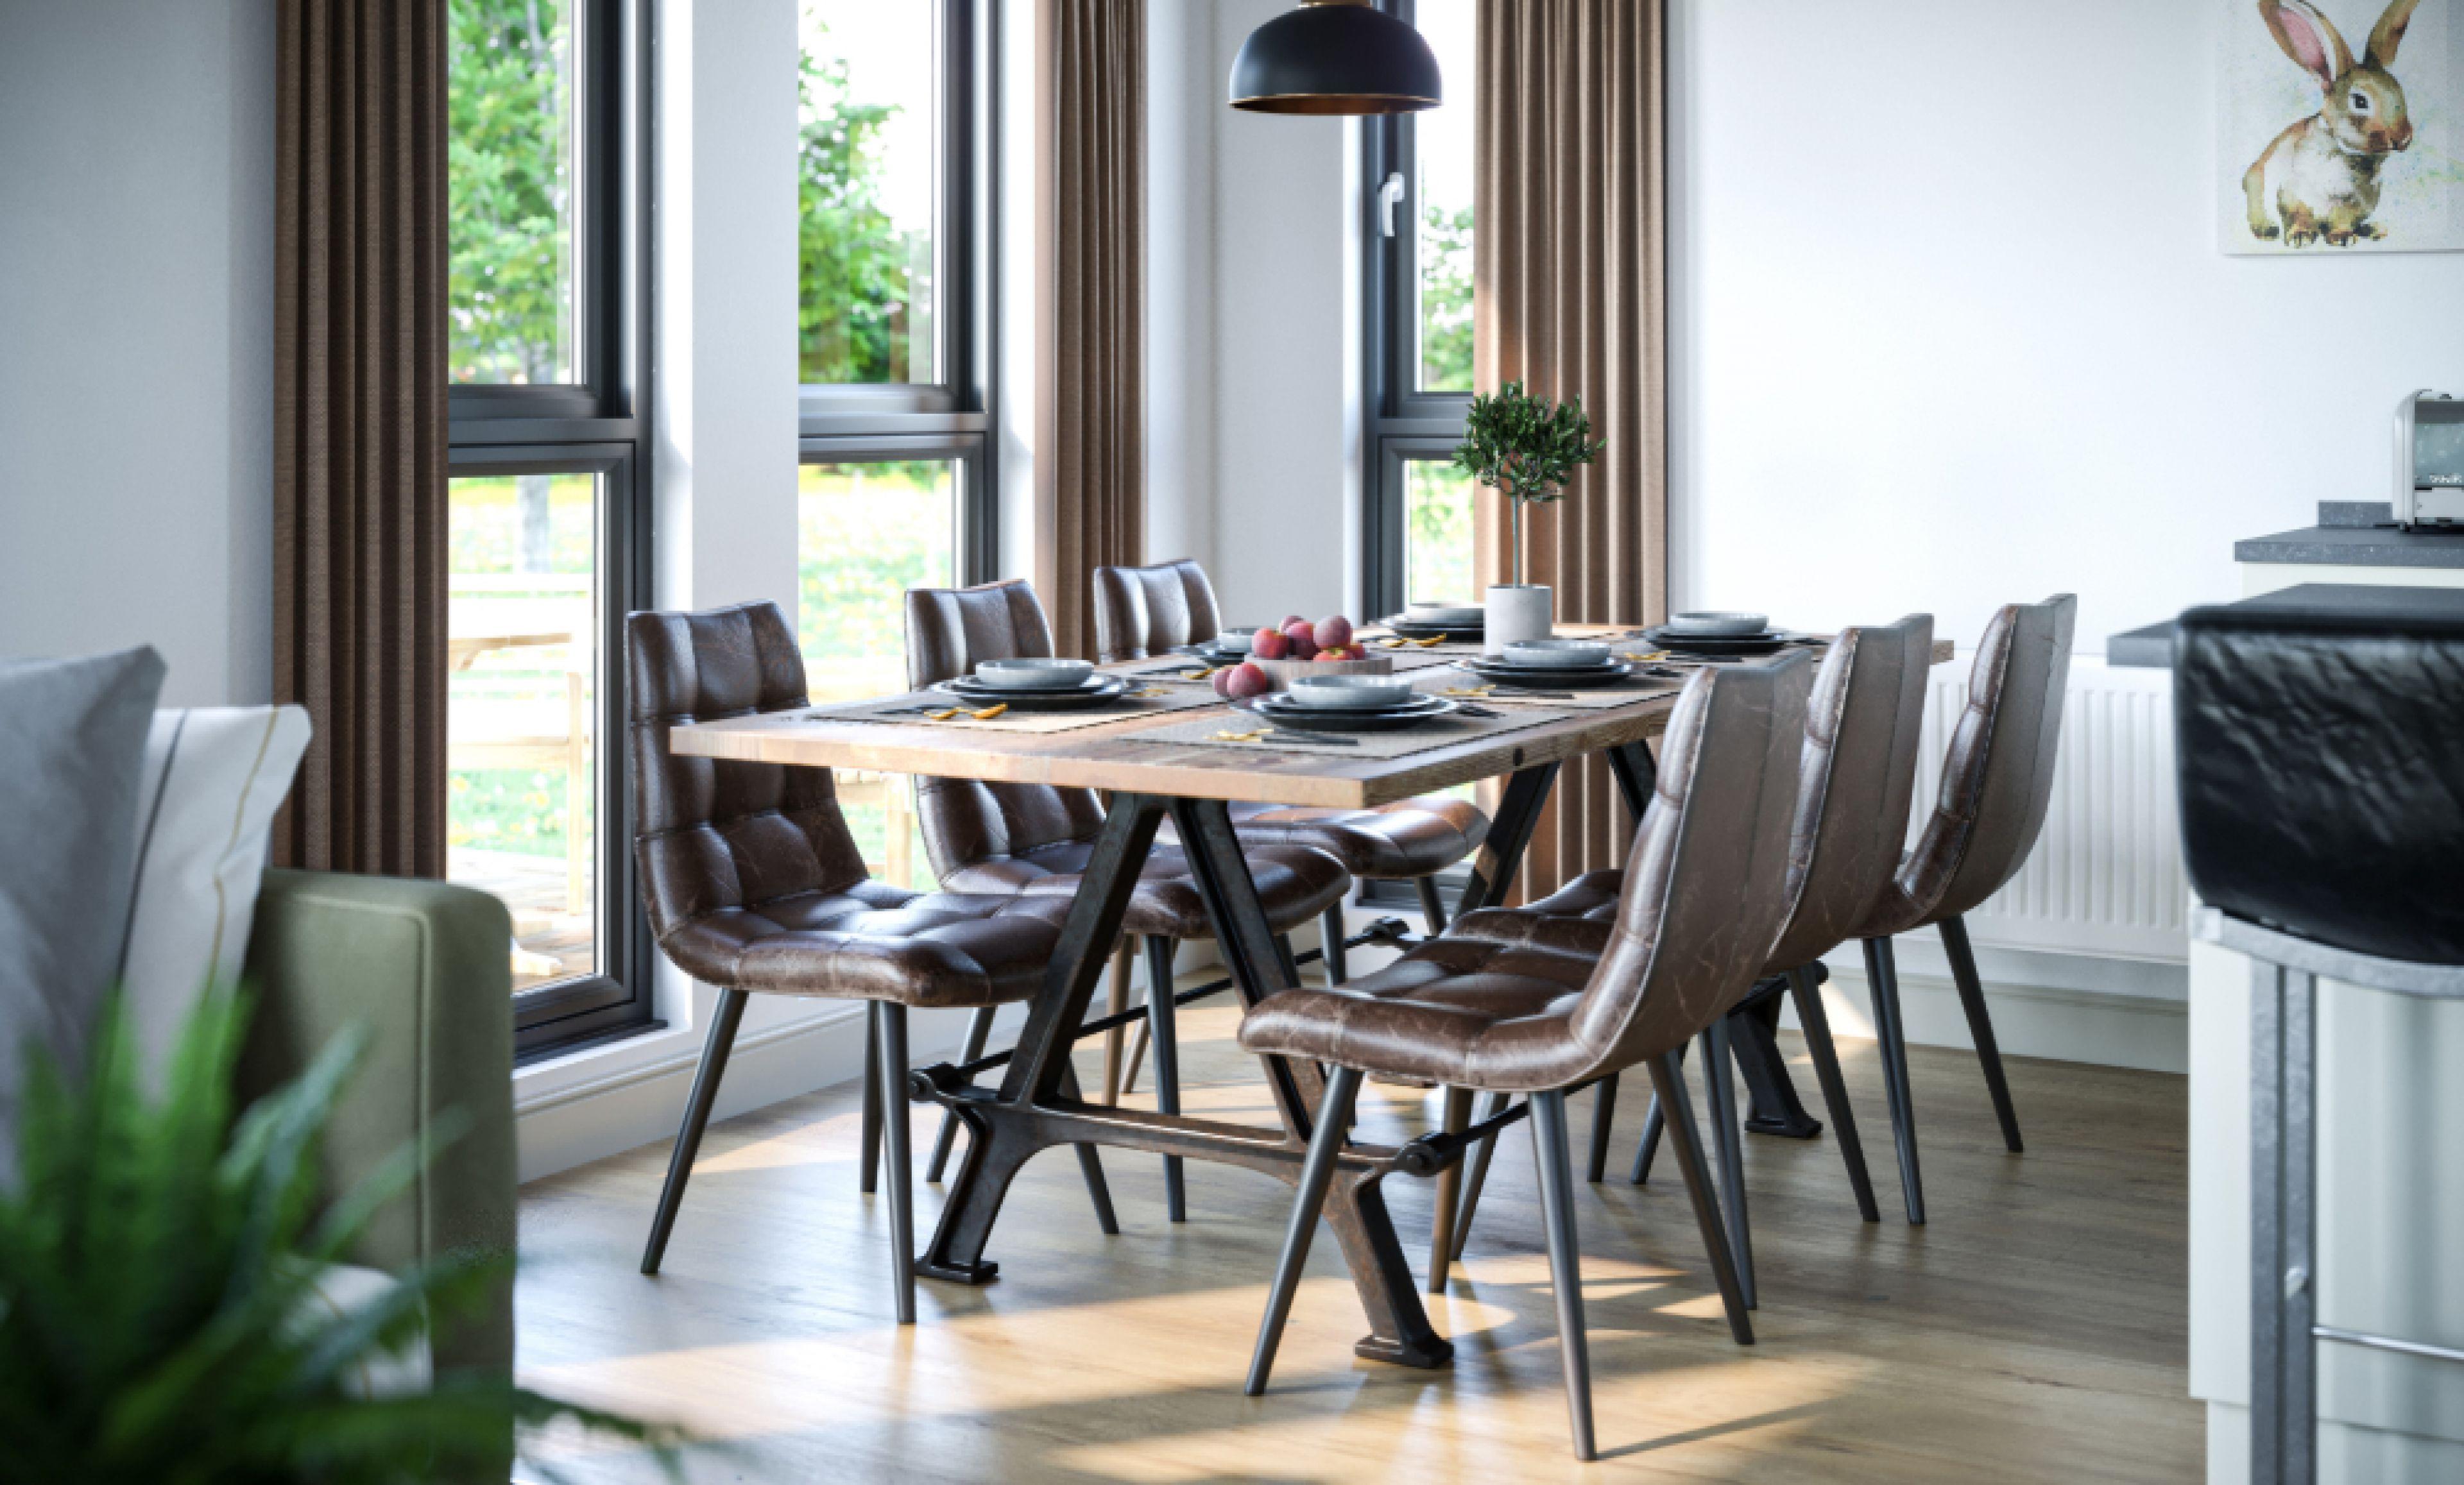 Brampton - The dining room